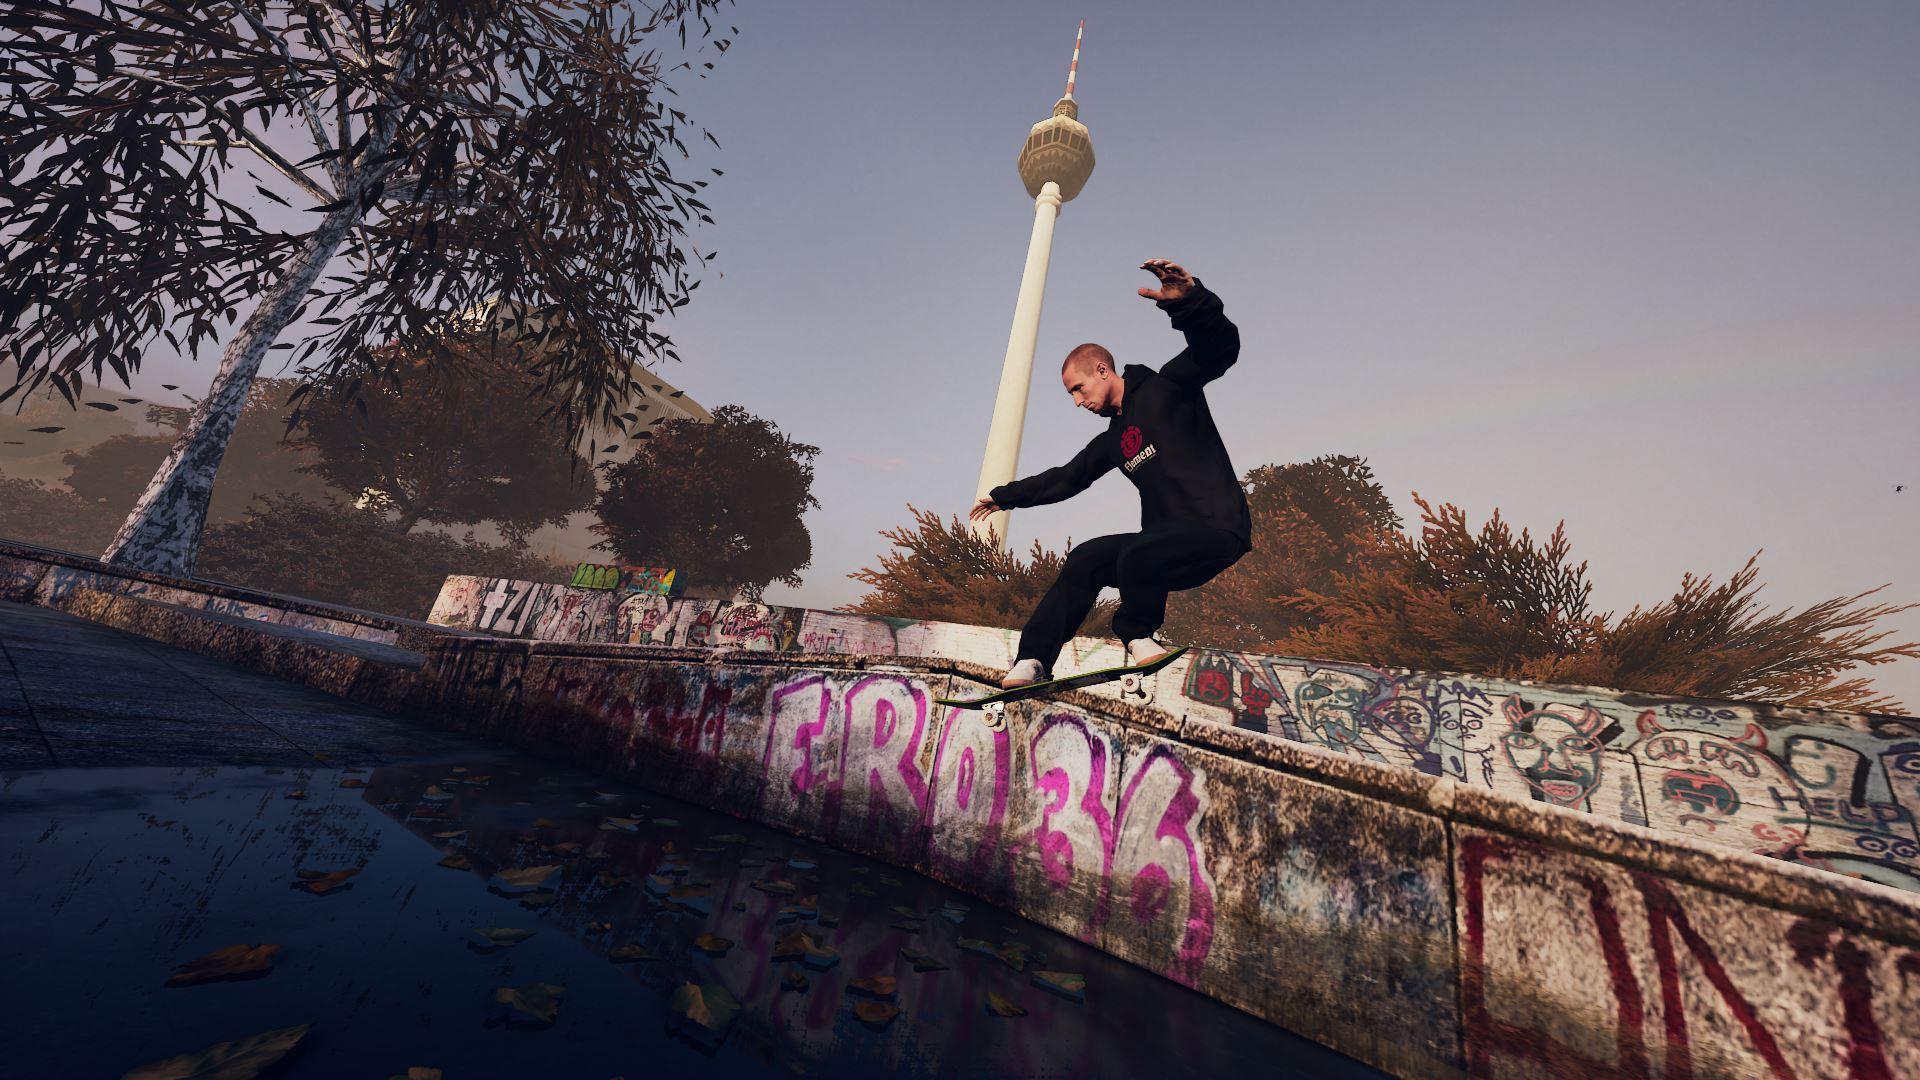 skater-xl-berlin